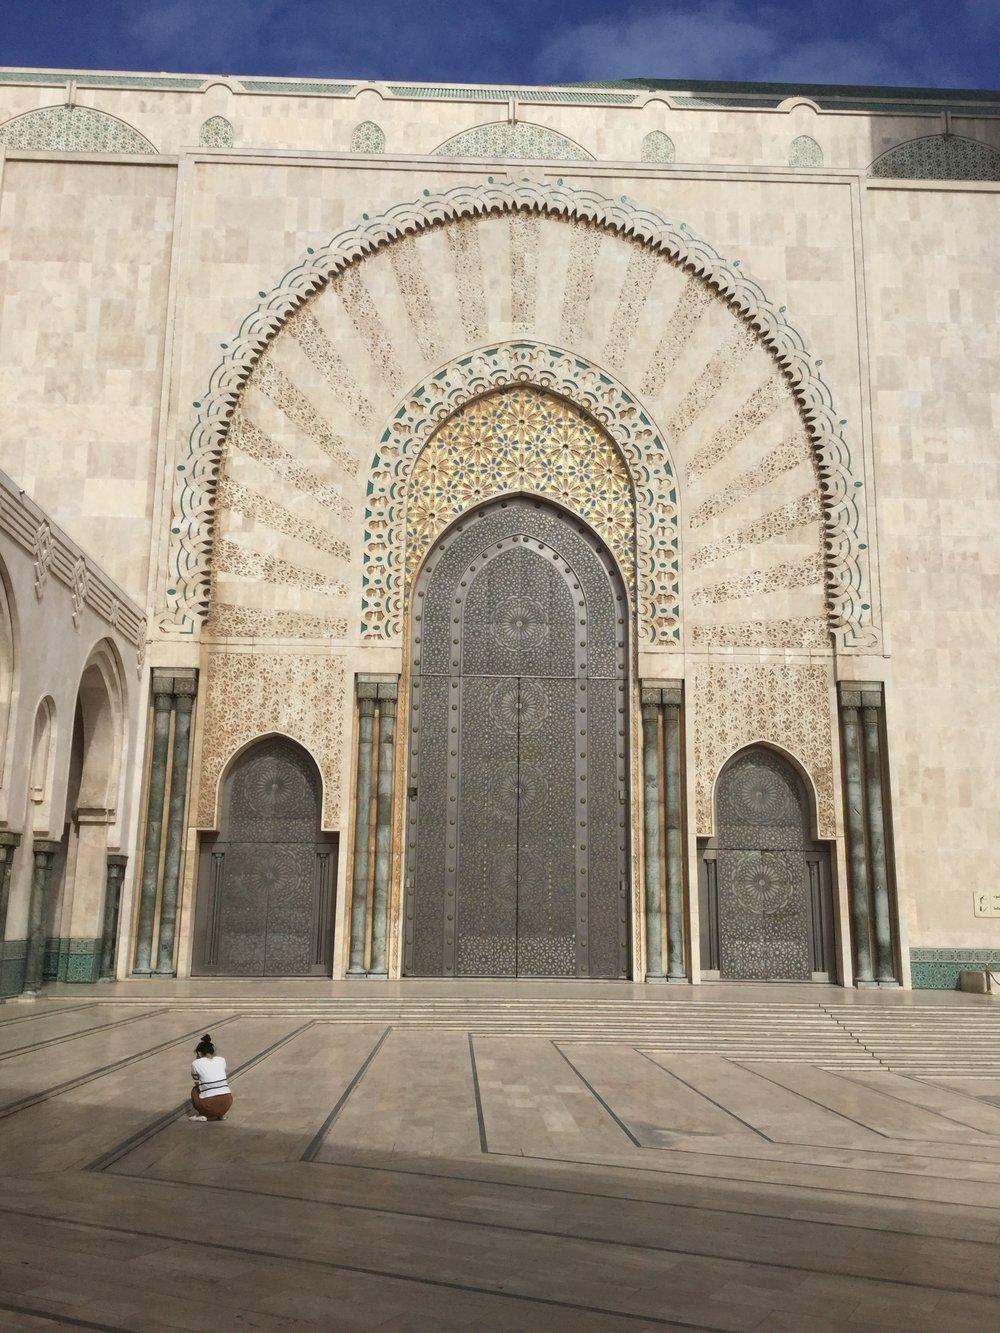 Enormous doors. Just enormous.